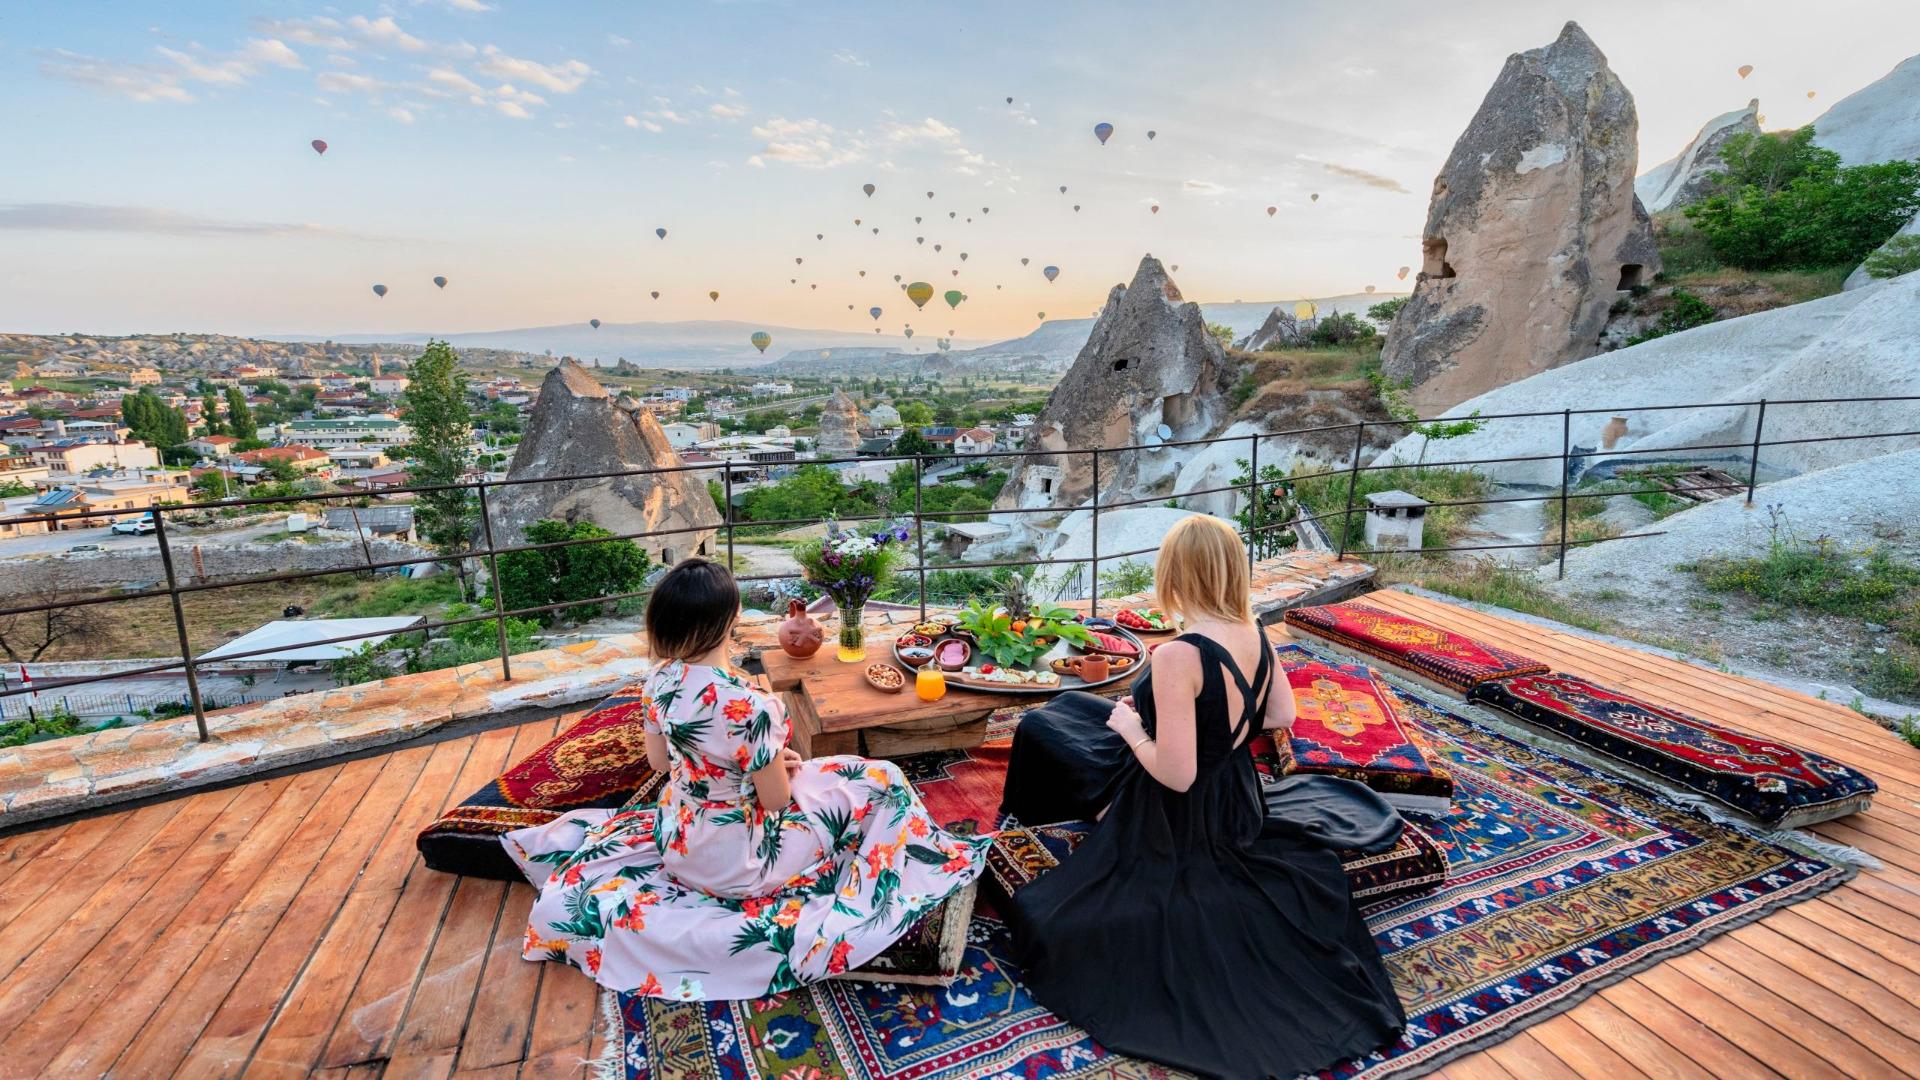 Anatolian Houses Hotel Goreme Cappadocia Turkey Small